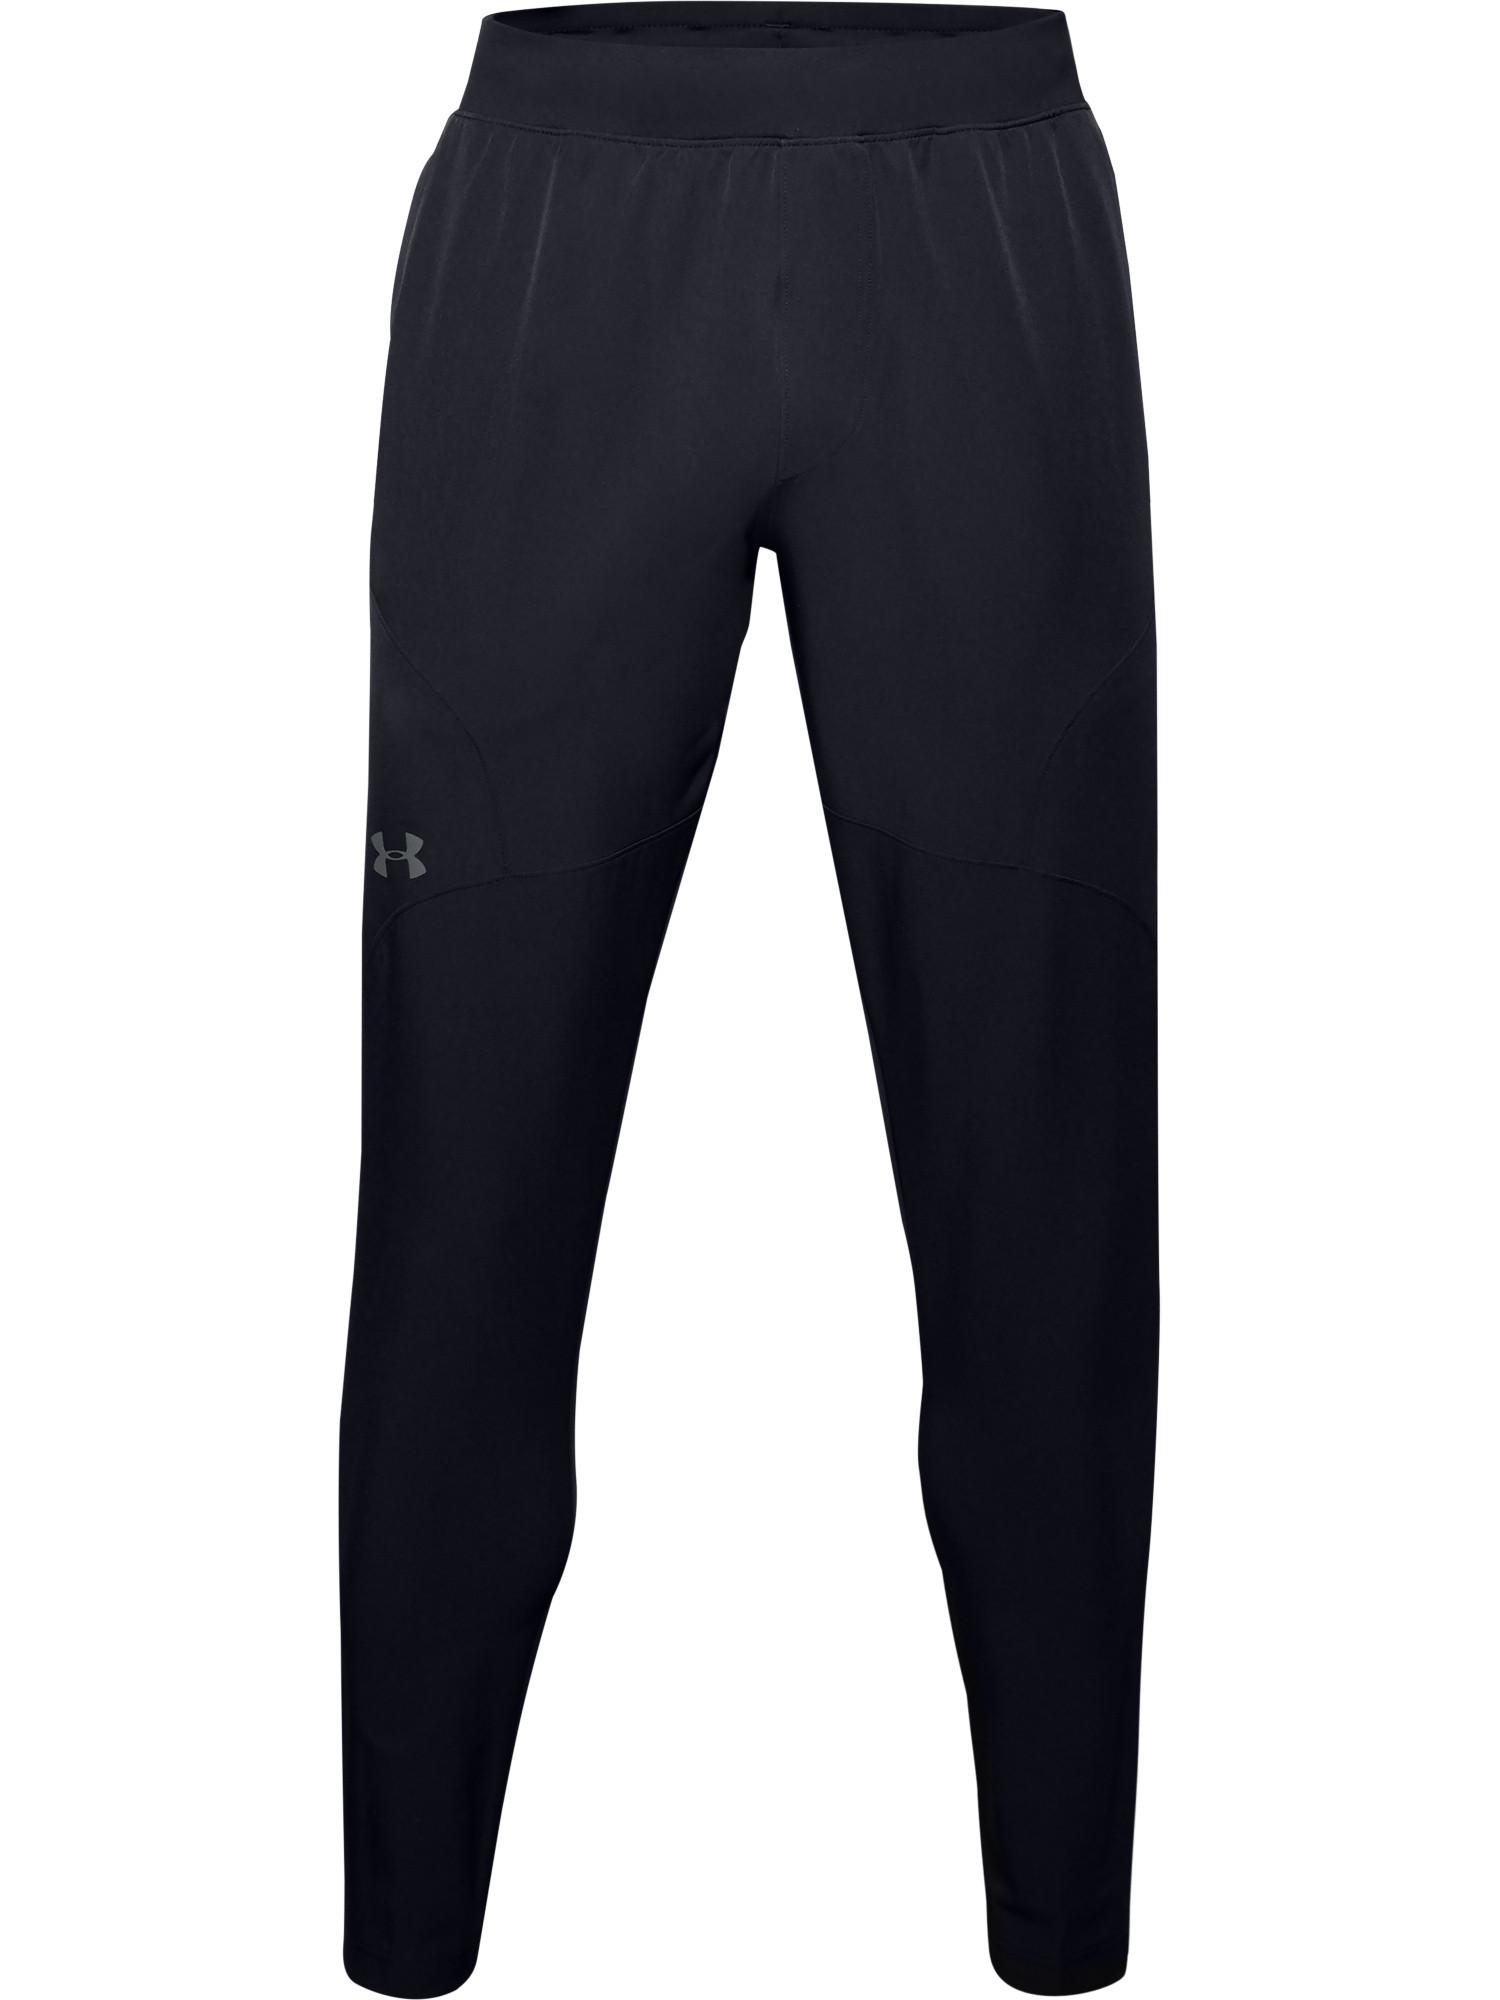 Pantaloni affusolati UA Flex Woven da uomo, Nero, large image number 0